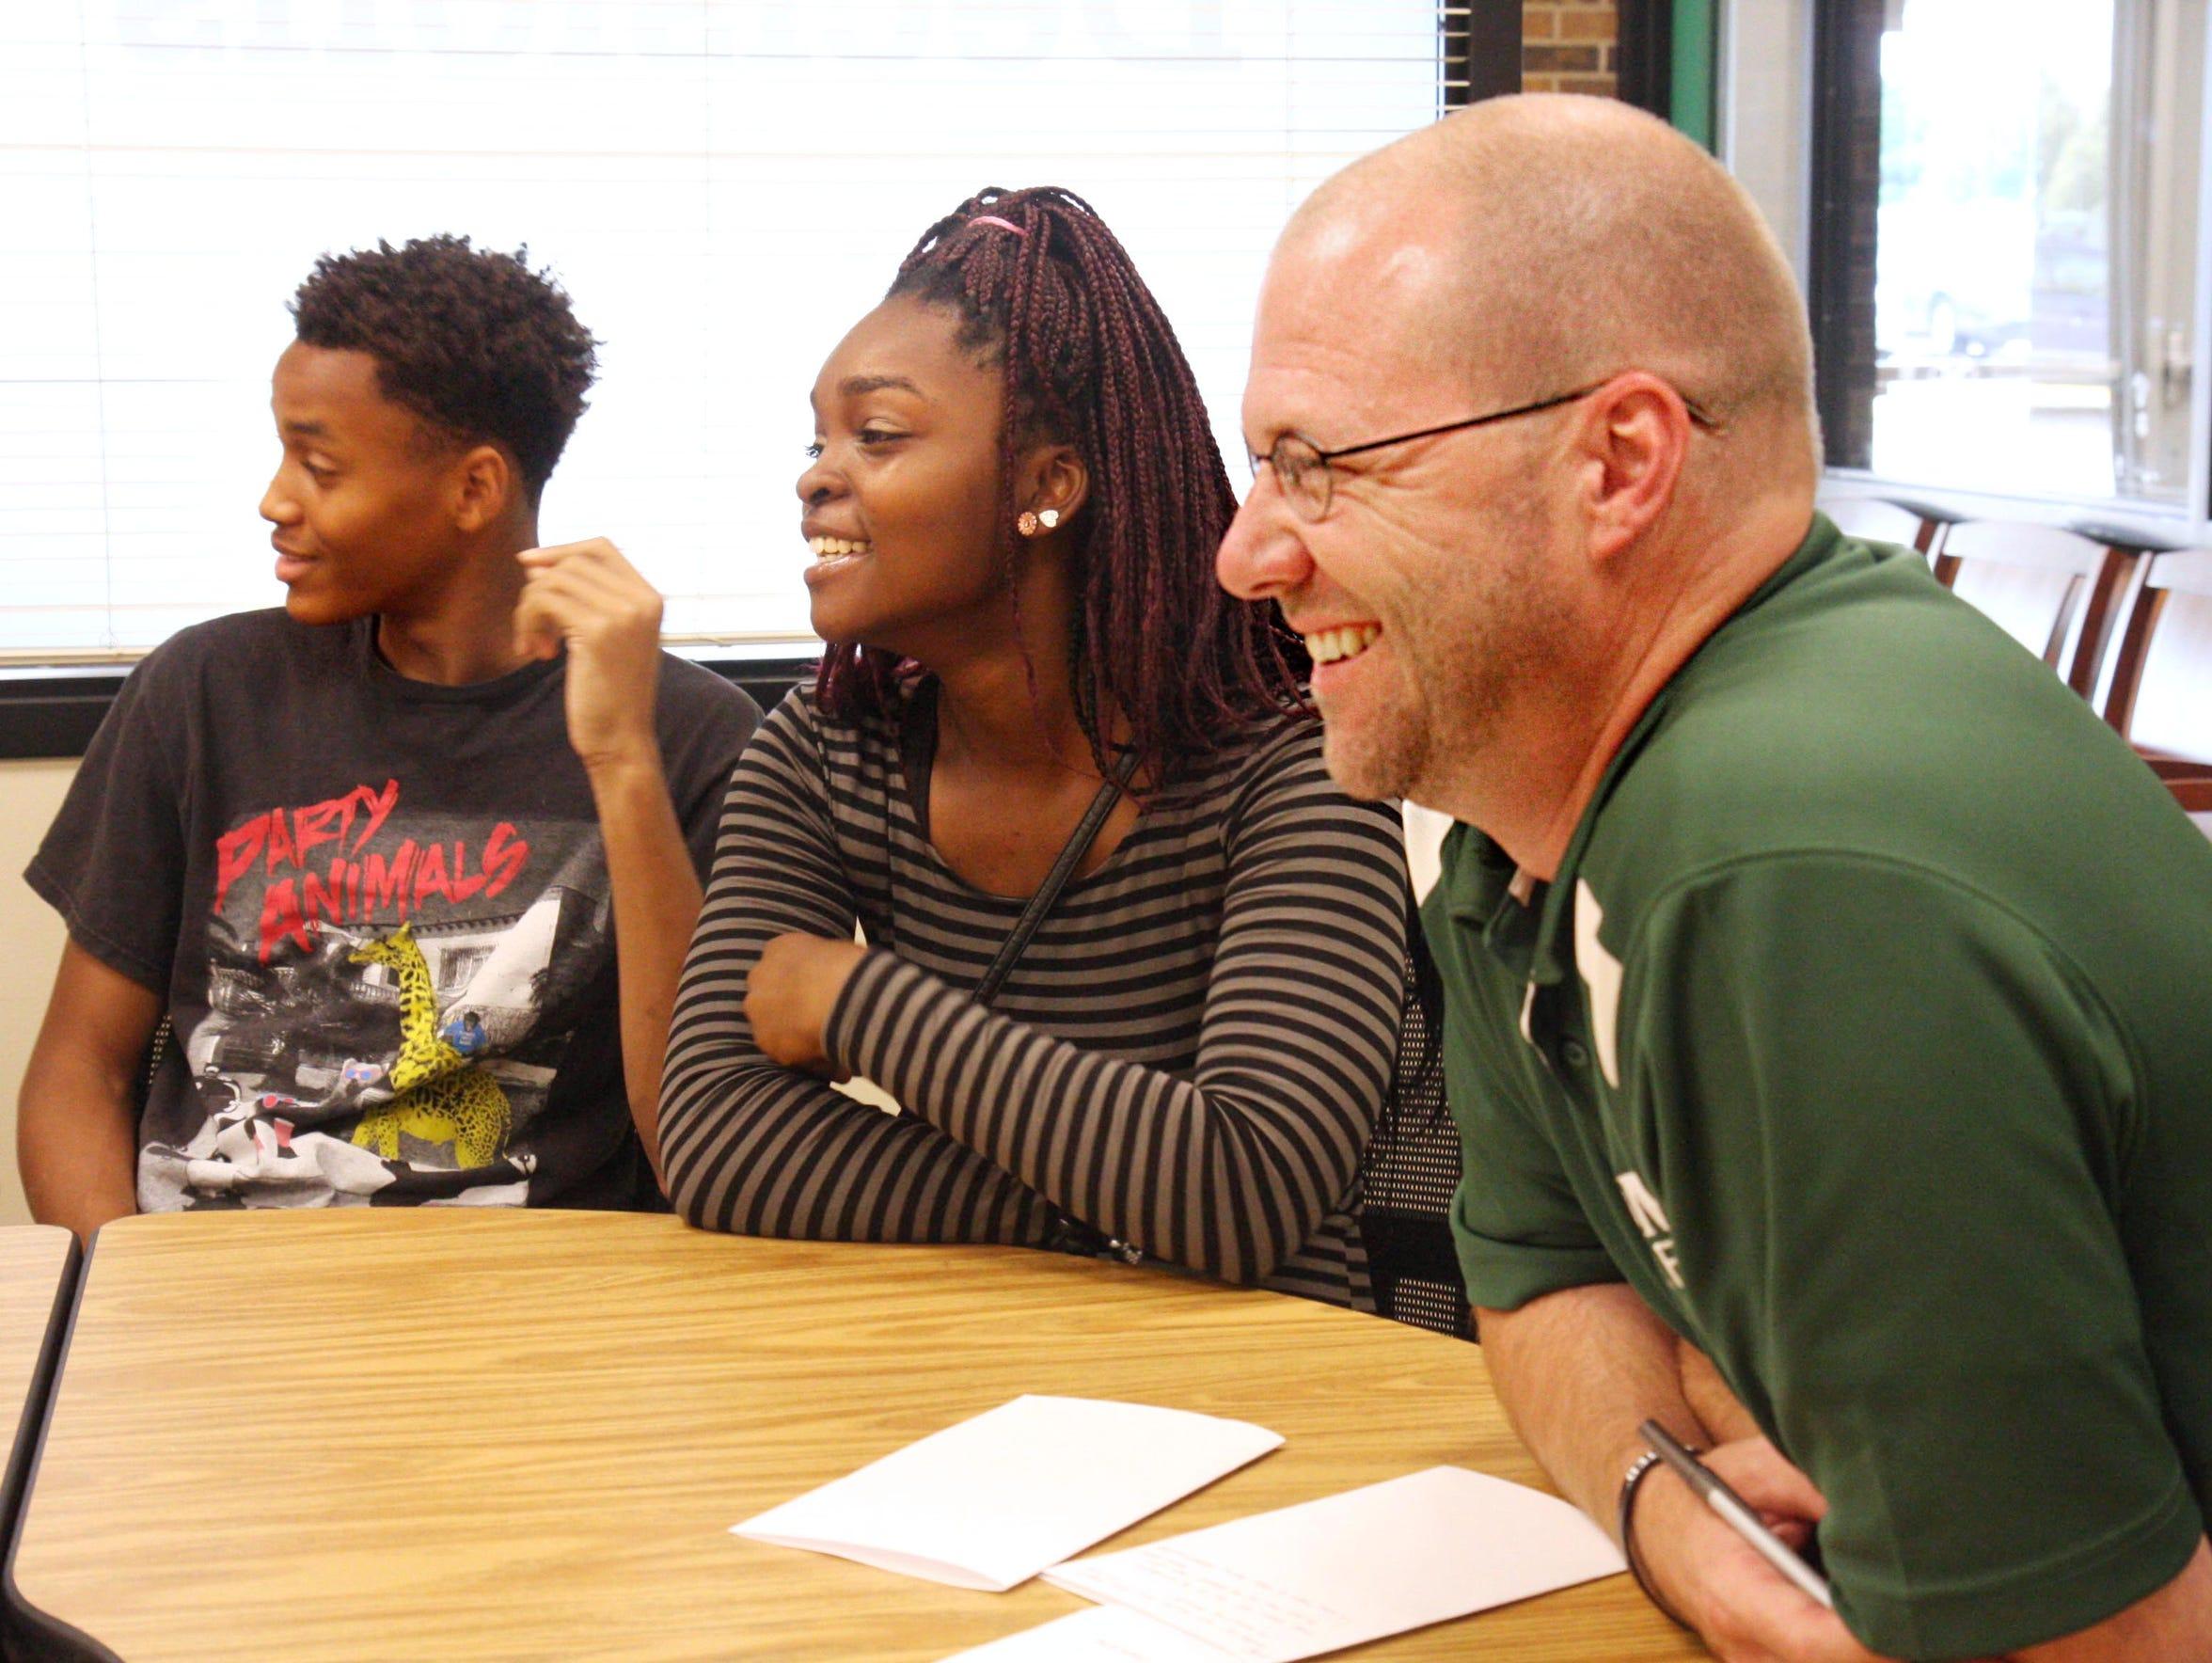 Madison Memorial High School Principal Jay Affeldt,